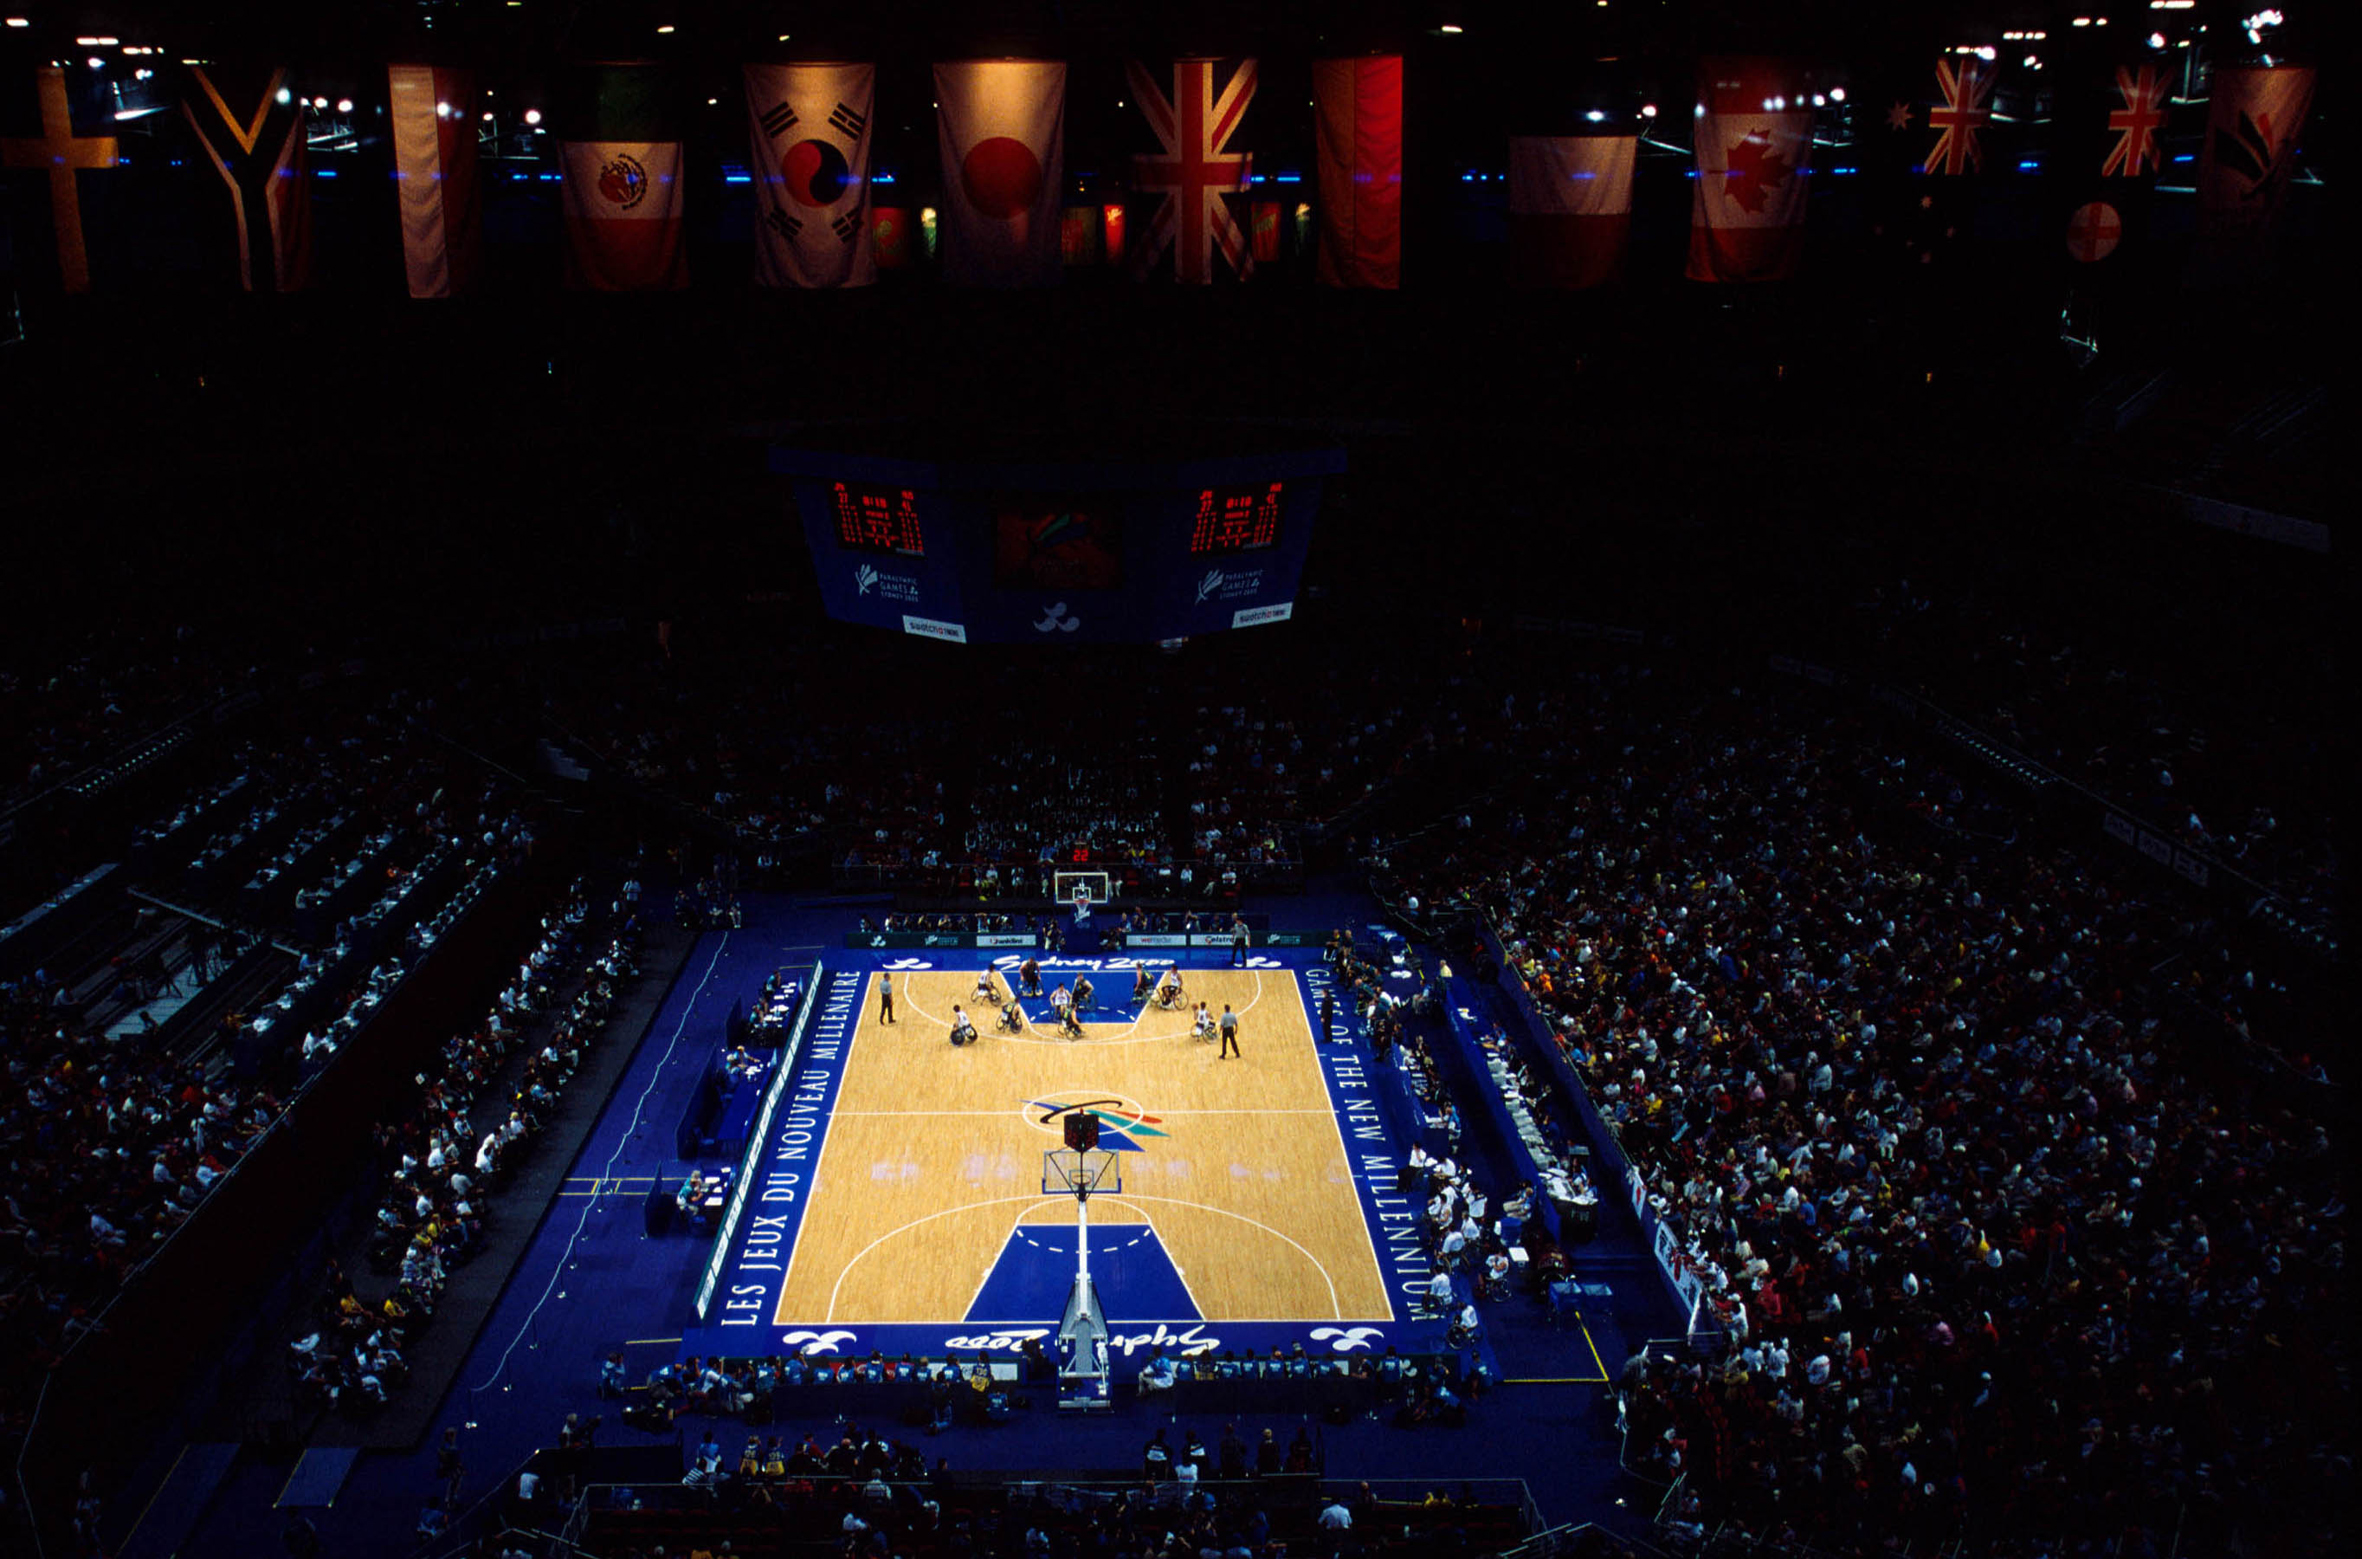 File:251000 - Wheelchair basketball Superdome view - 3b ...